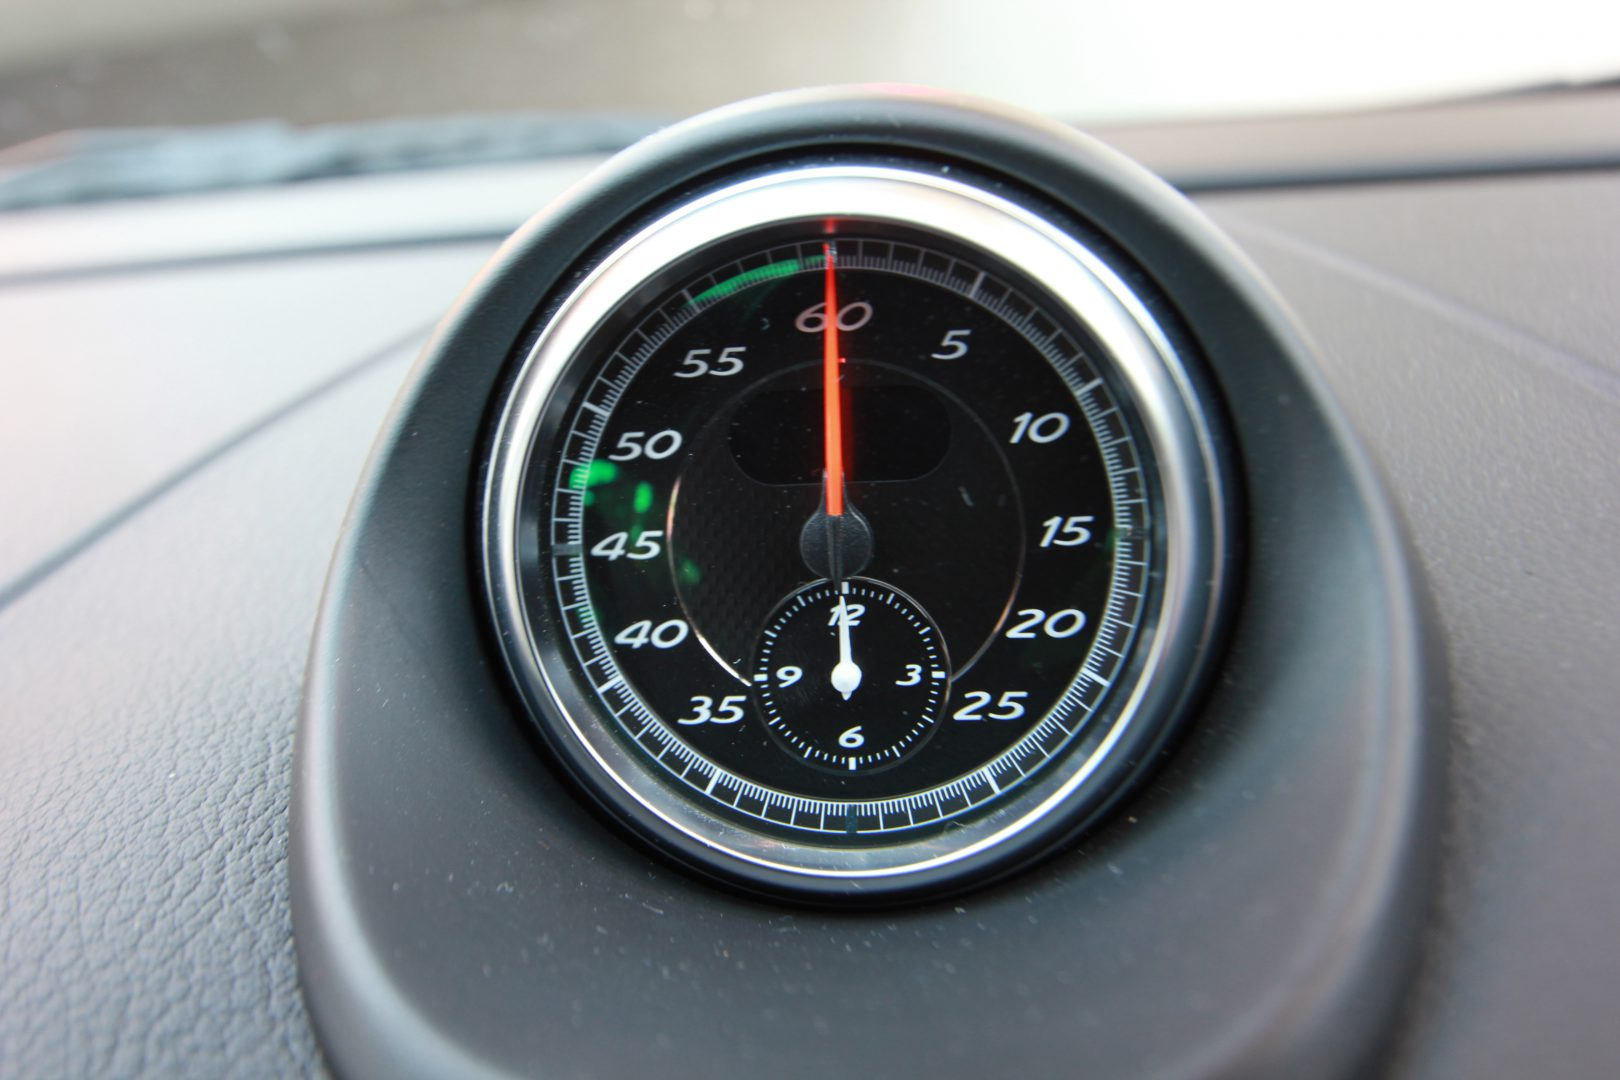 AIL Porsche Cayman S Black Edition PDK Sport Chrono 12